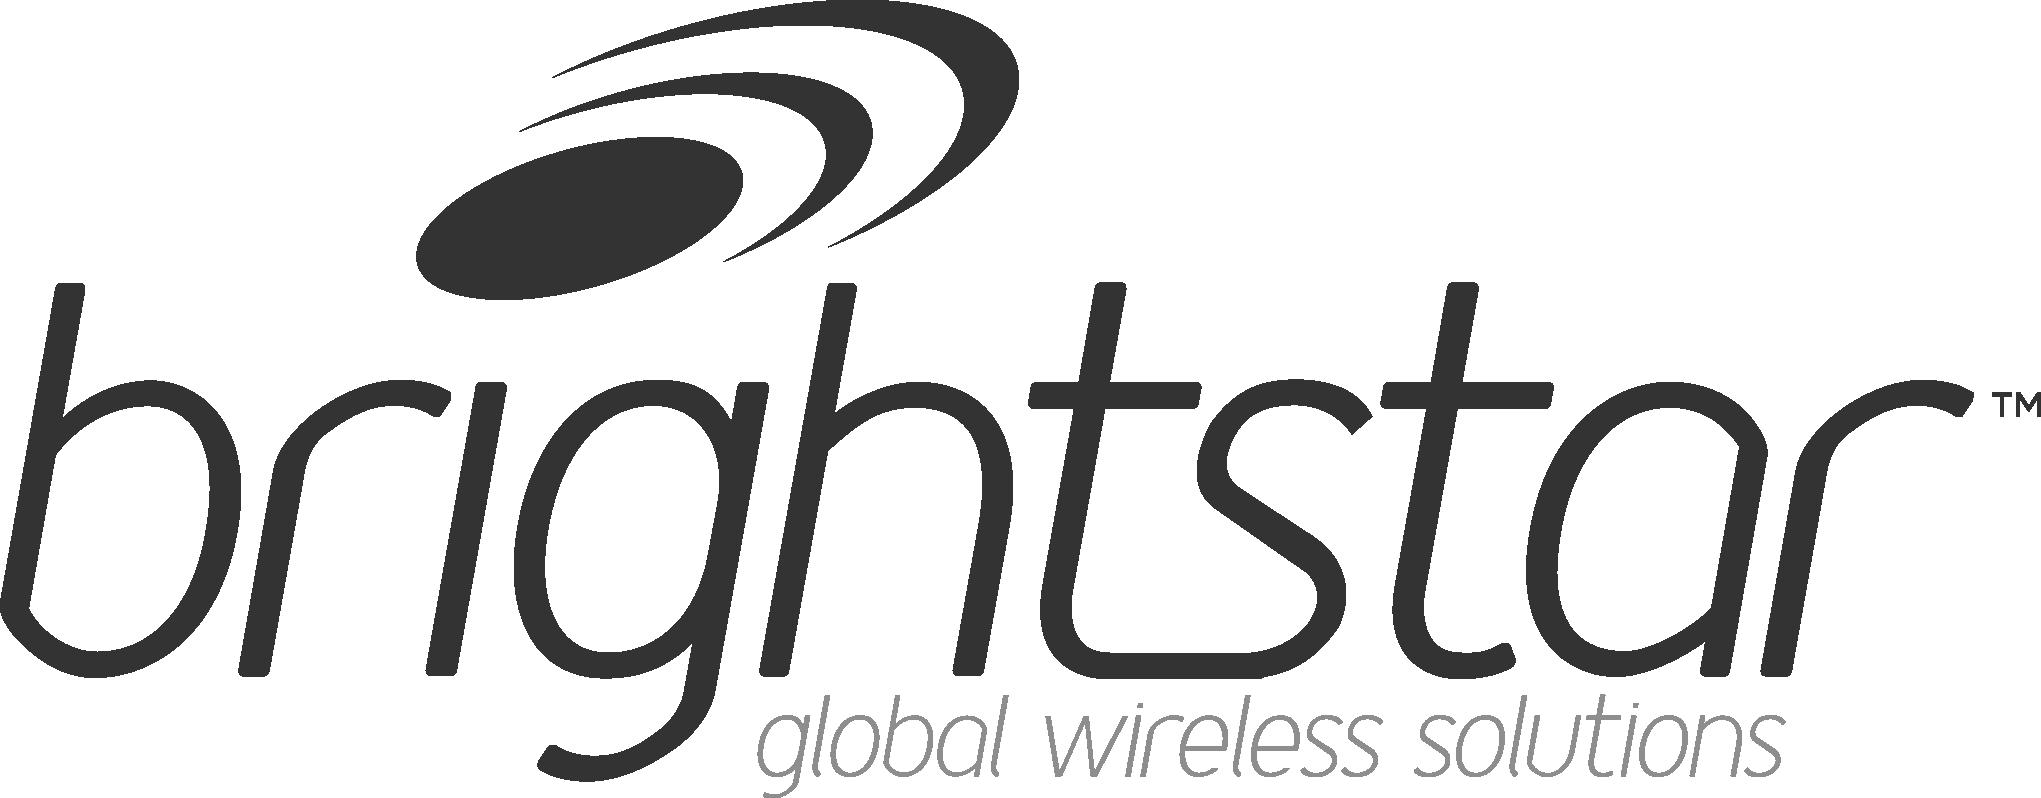 brighstar logo.png